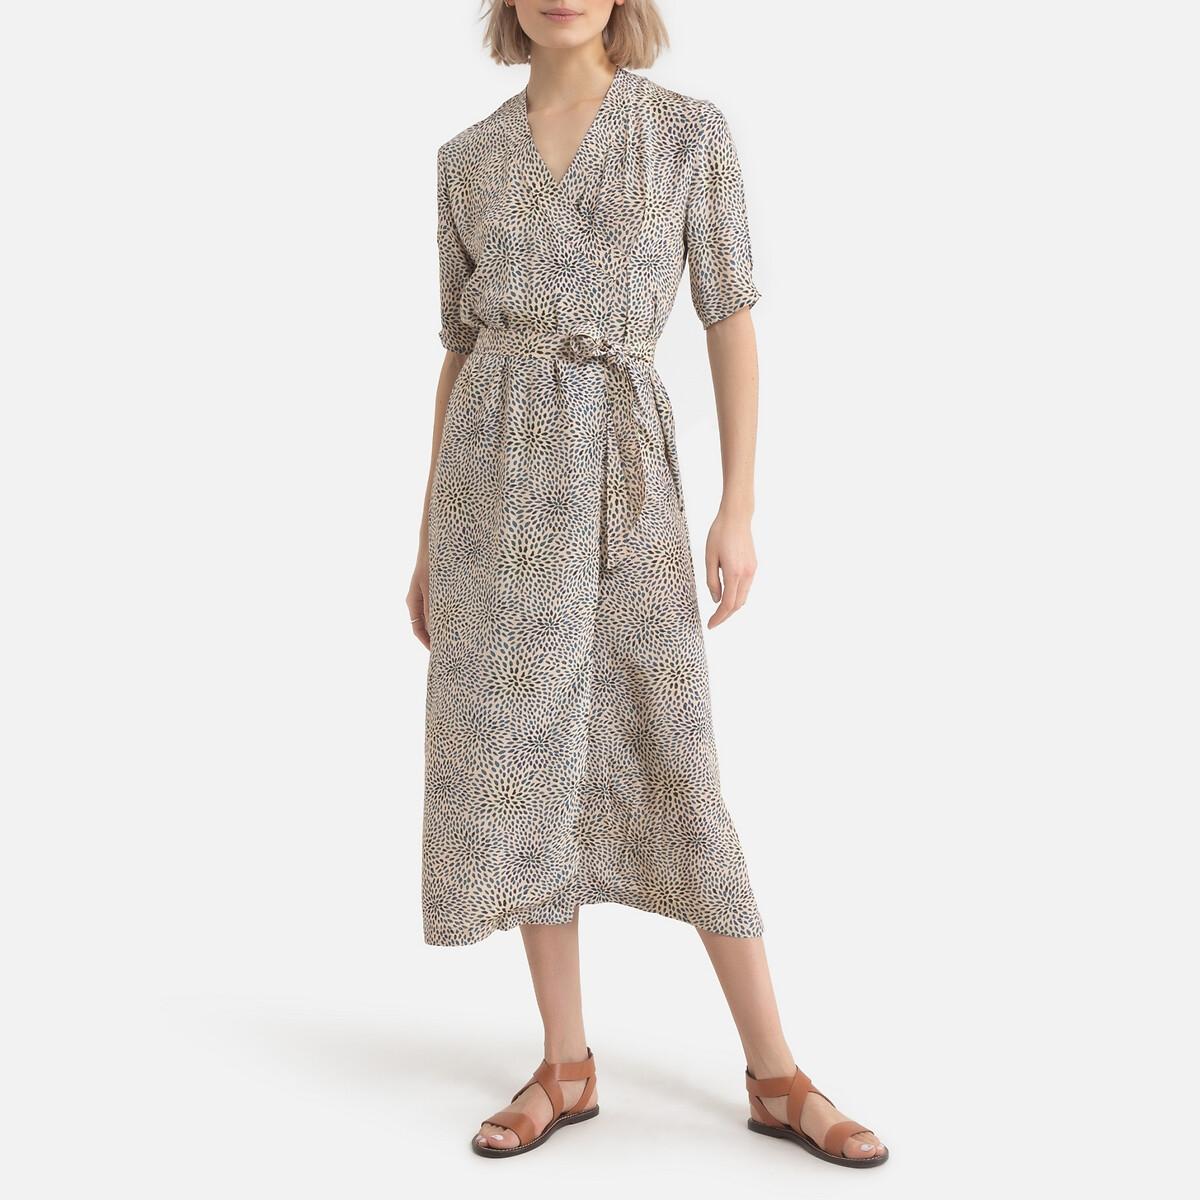 Фото - Платье LaRedoute С запахом длинное с короткими рукавами MALAGA 38 (FR) - 44 (RUS) синий платье laredoute с запахом с рисунком 34 fr 40 rus синий